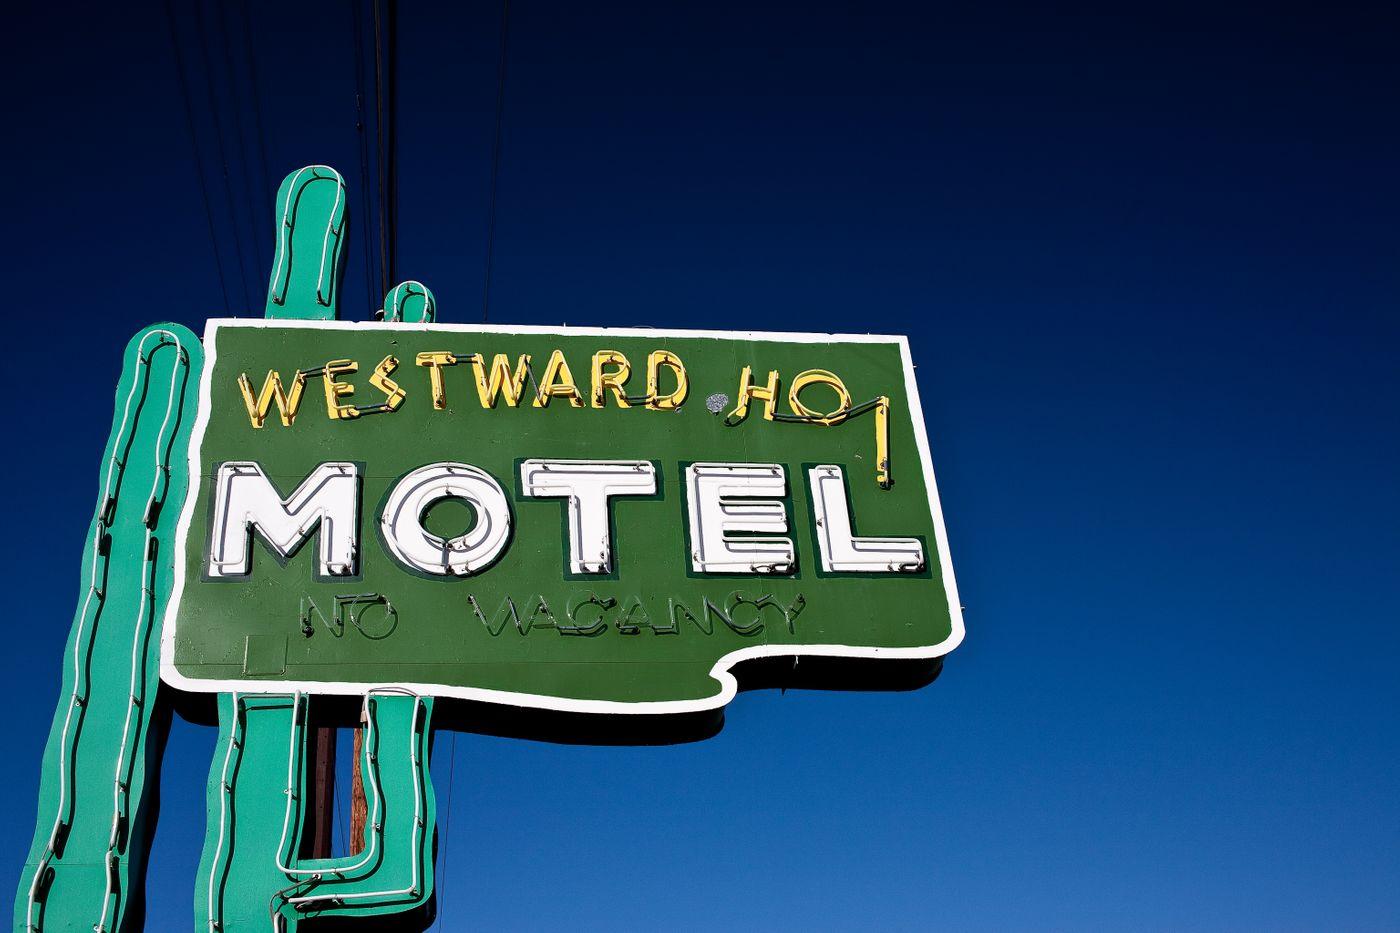 motel-web-2020-jpg-7-PRINT.jpg